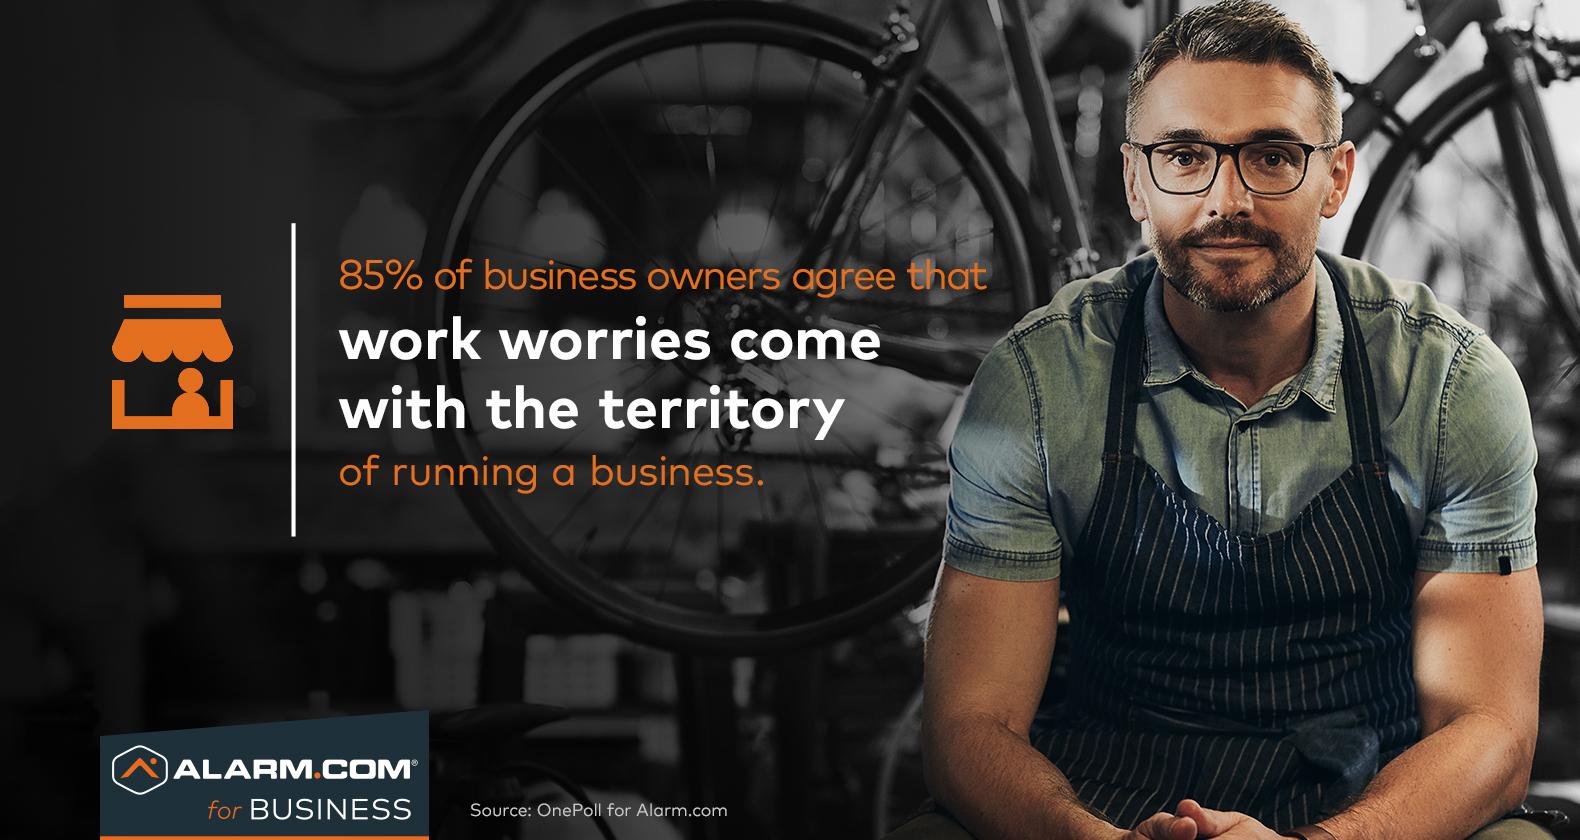 SMB_WorkWorries4_FB